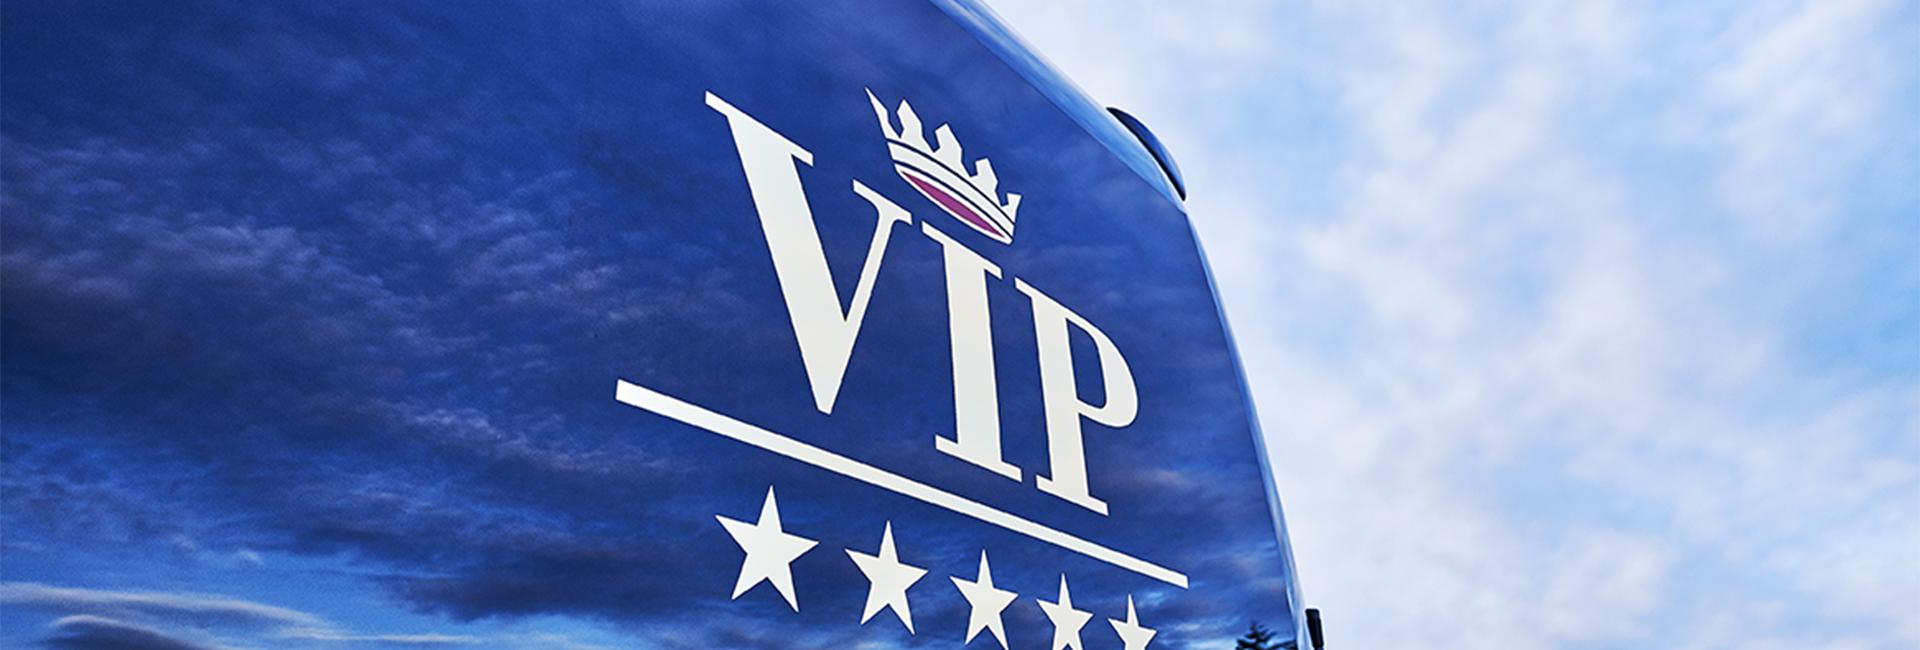 Luksus VIP bus